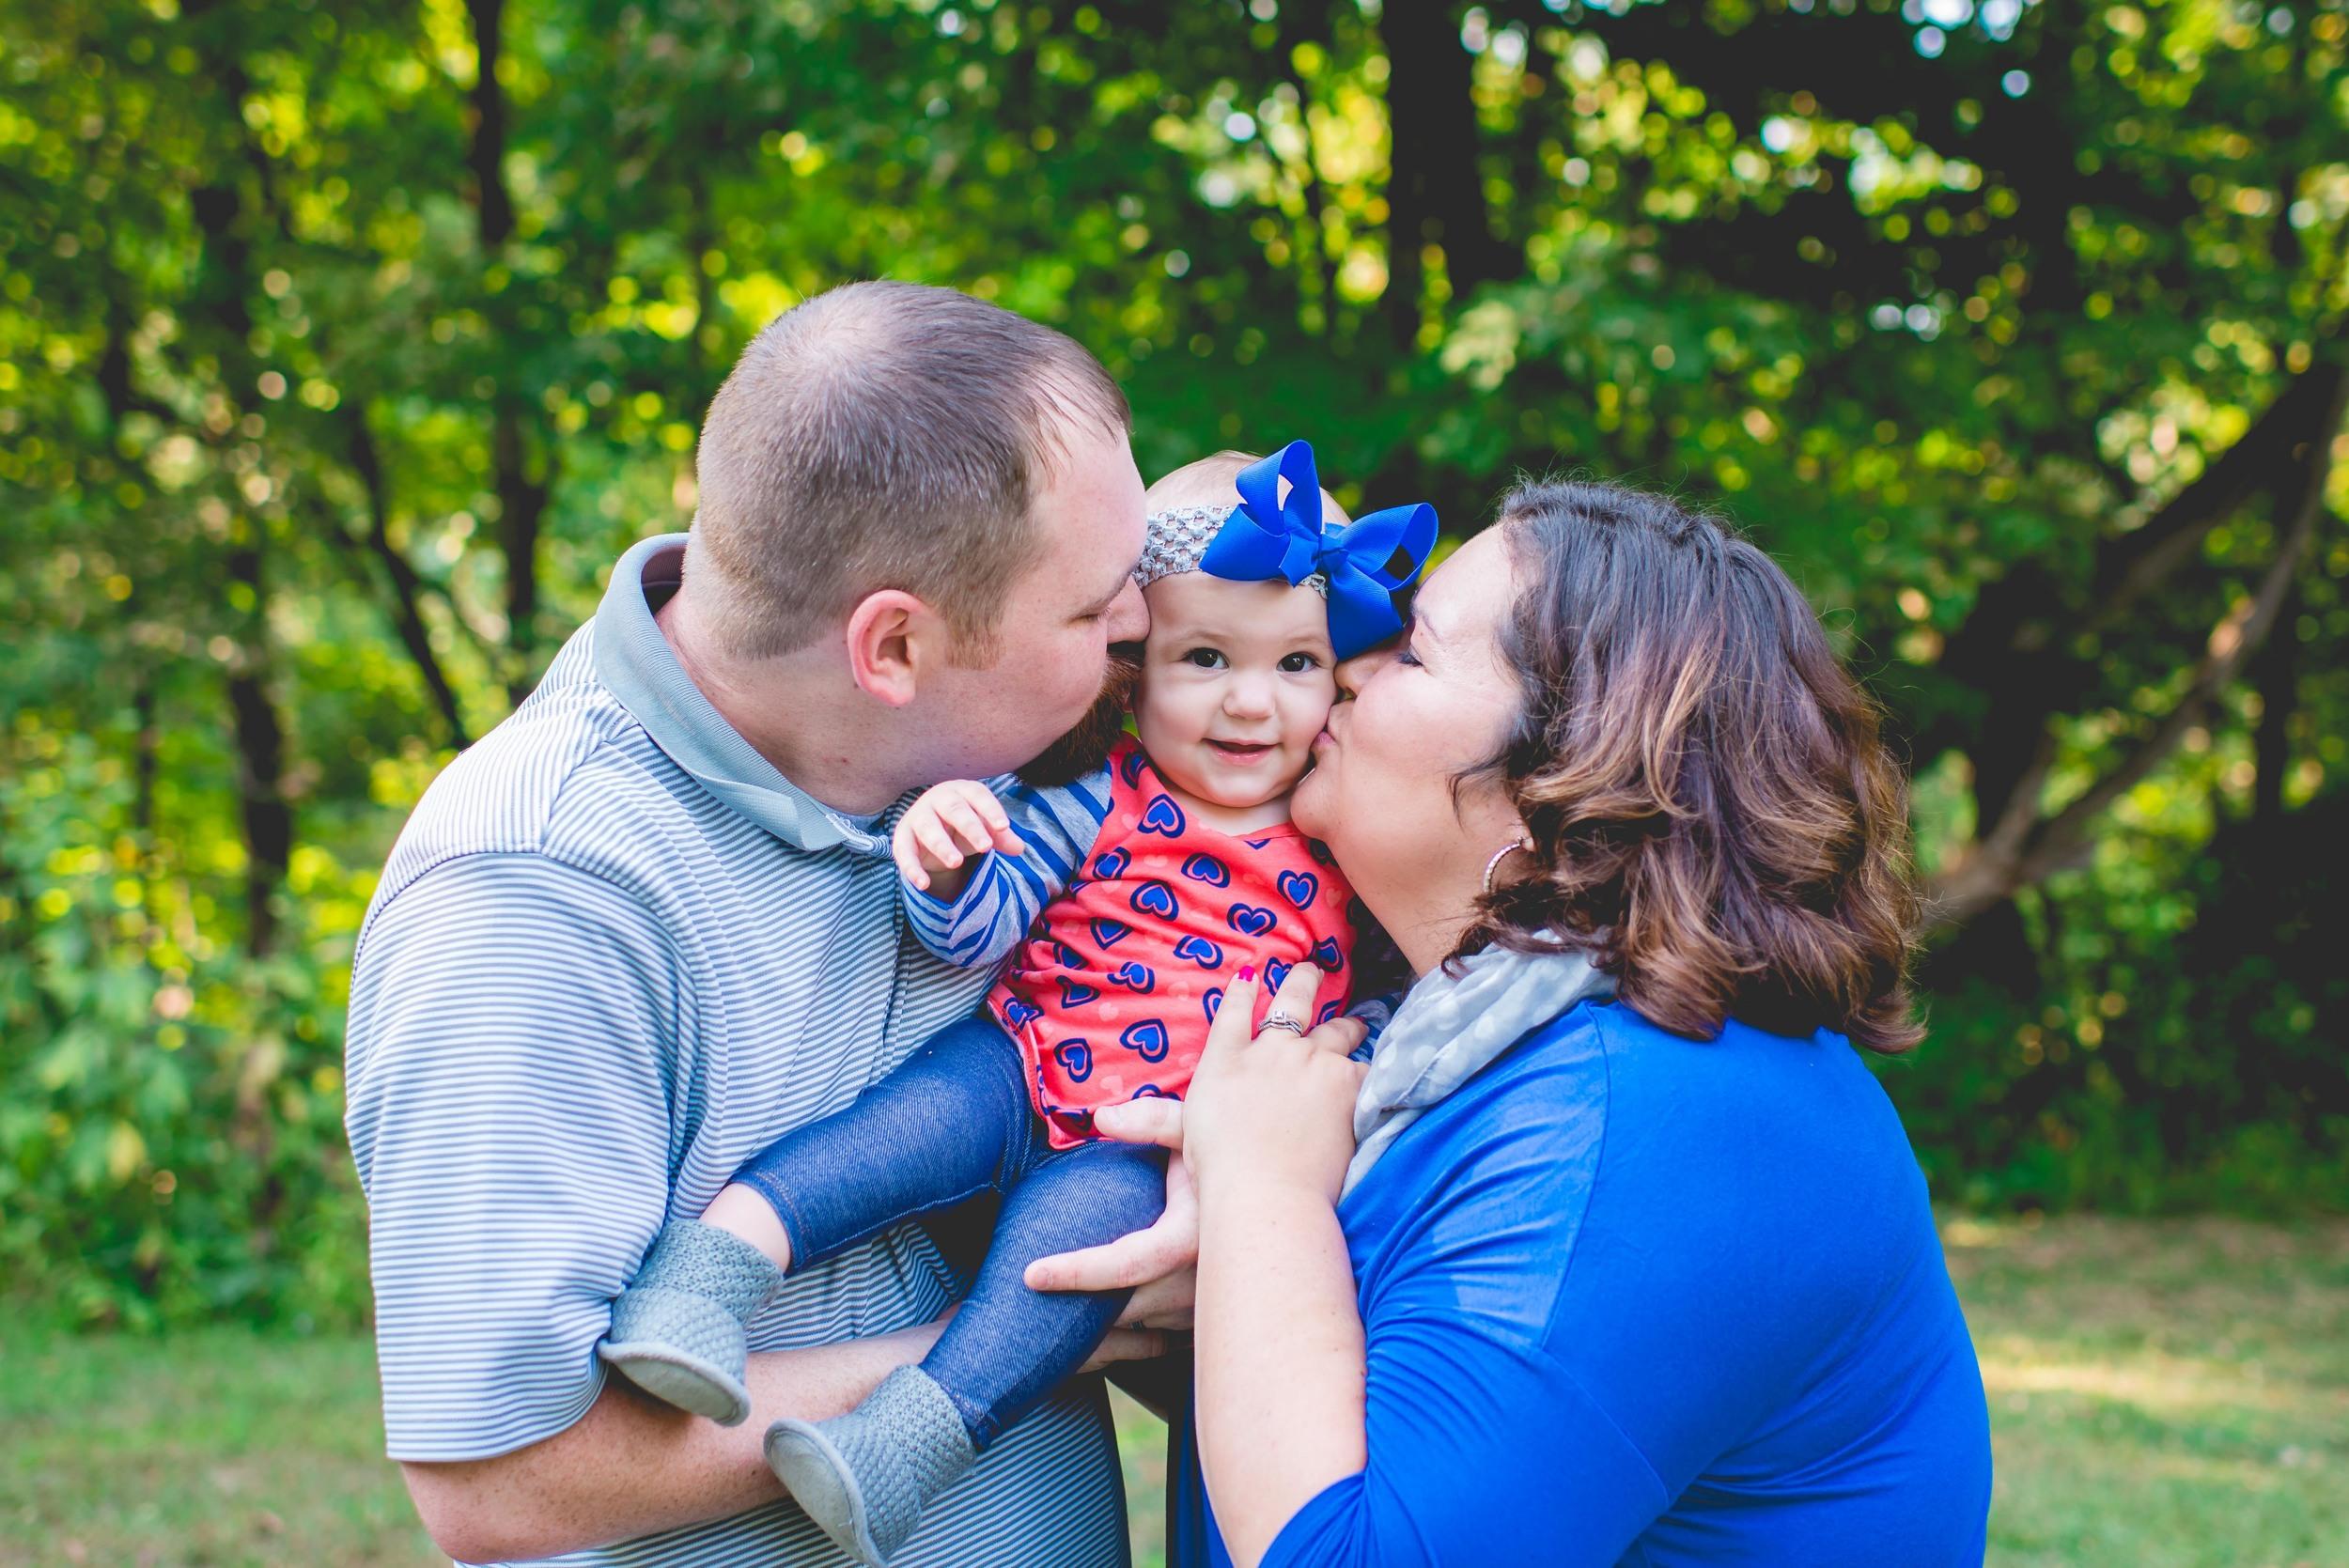 sarasutterphotography_family_Johnson_2015-42.jpg